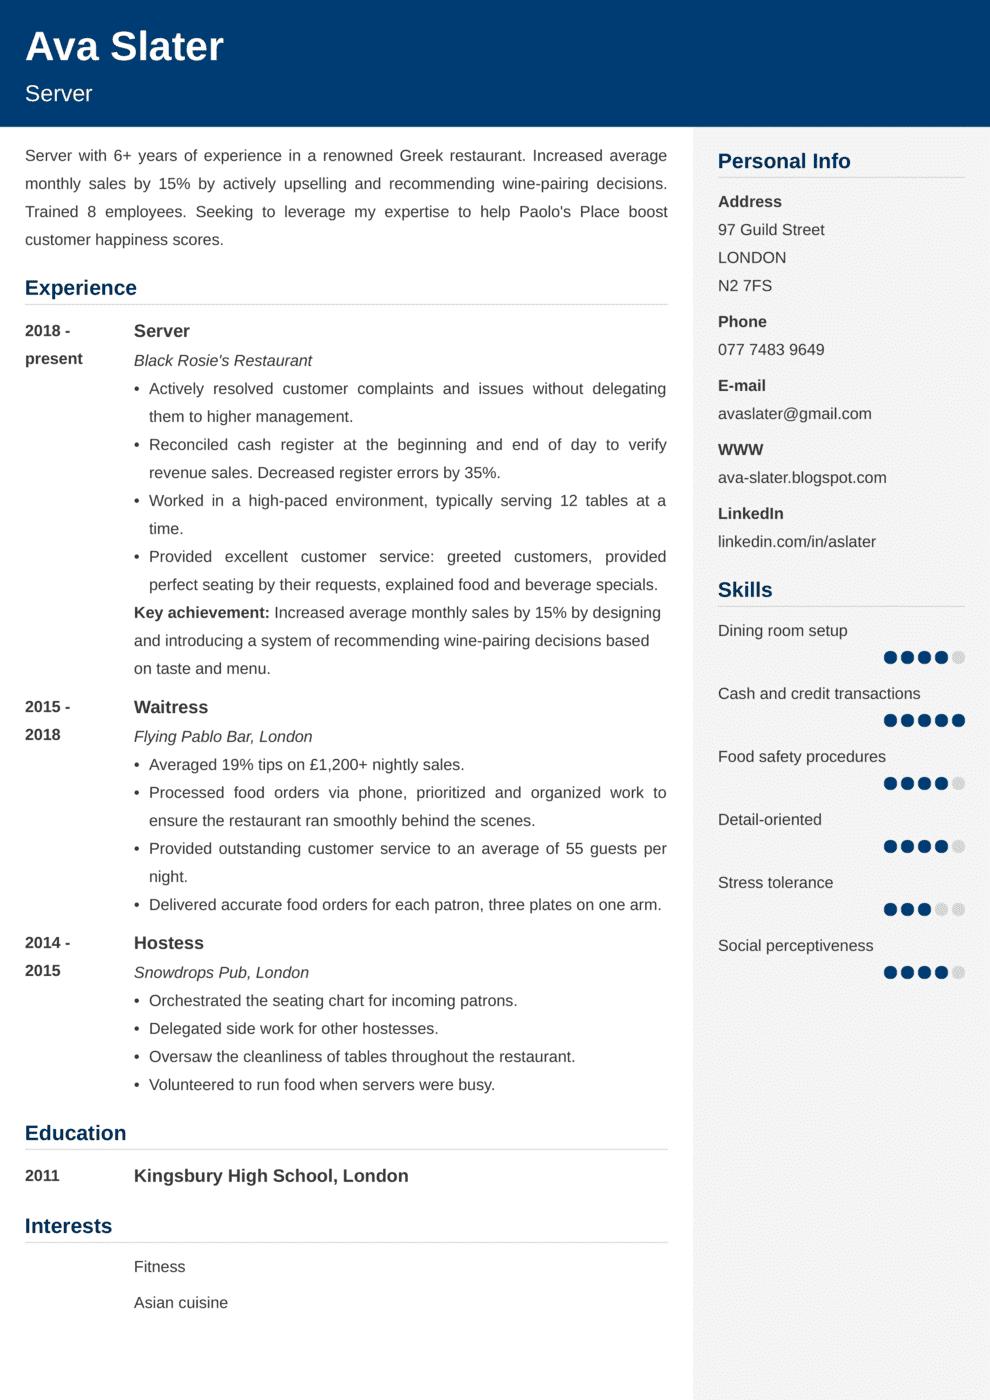 Server CV Example